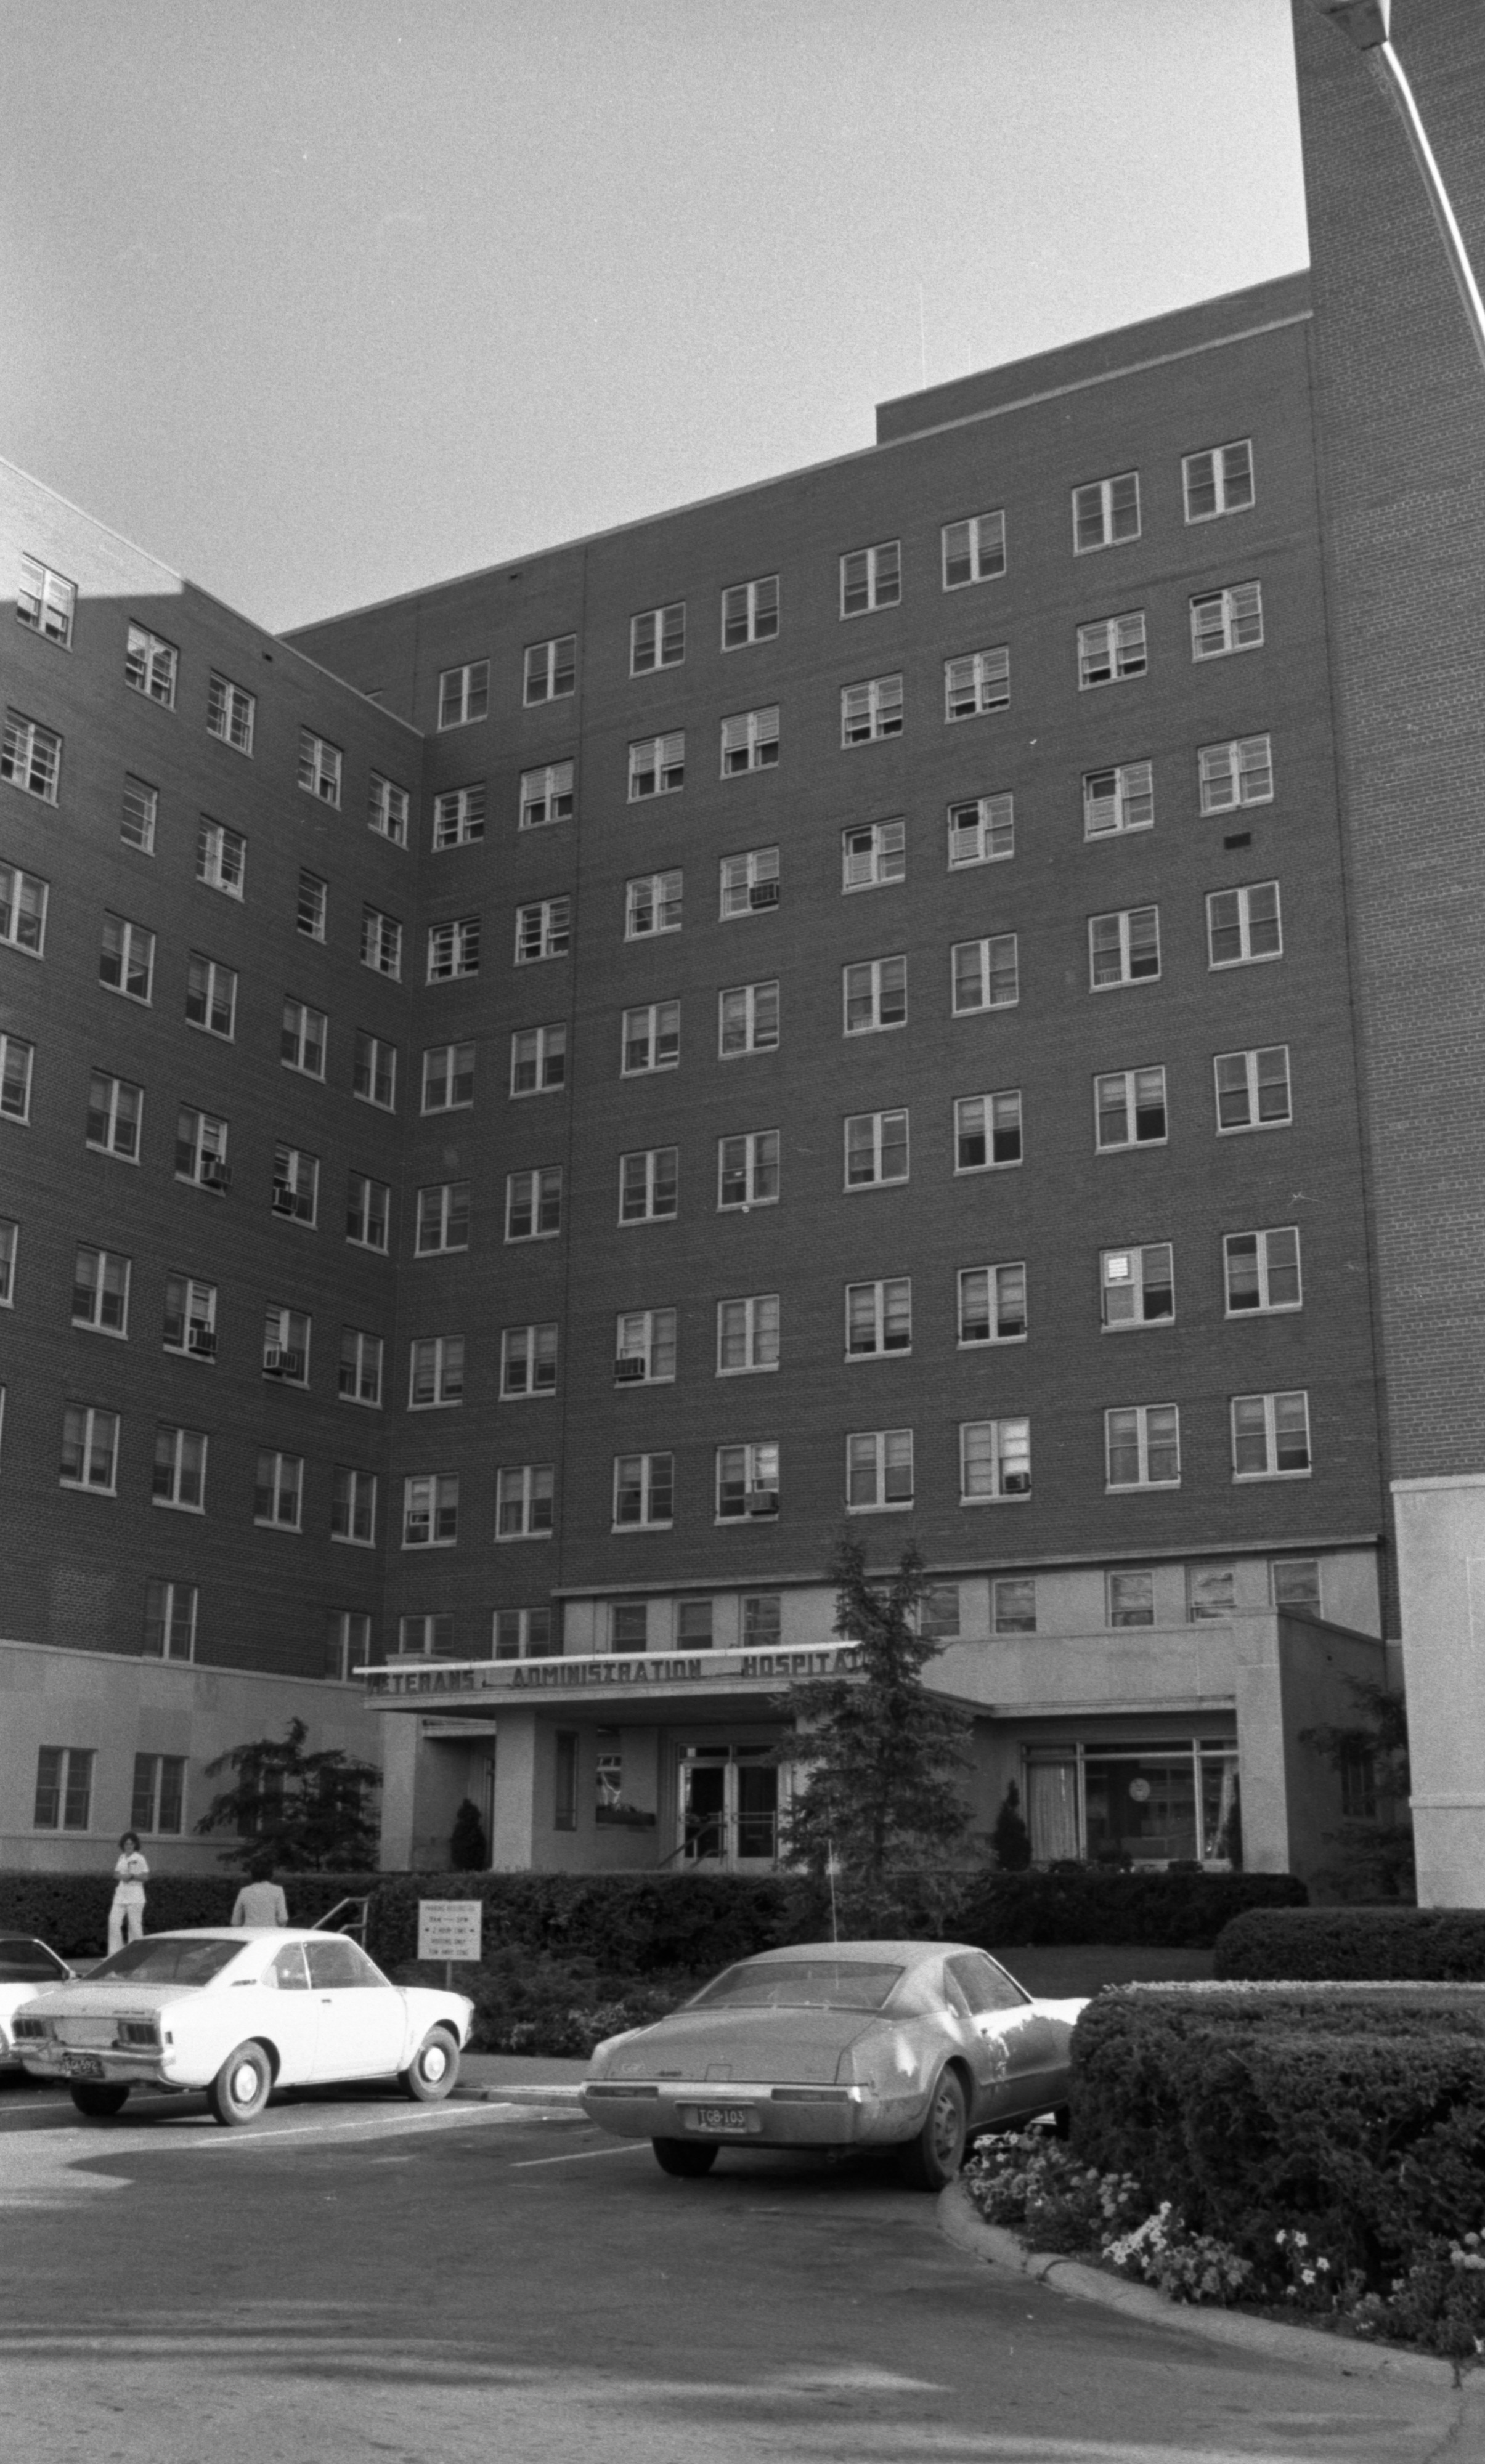 mhm 535 hospital administration mod 1 Clinical nurses' job stress, emotional labor, nursing performance, and burnout in comprehensive nursing care service wards and general wards so-eun kim, 1.